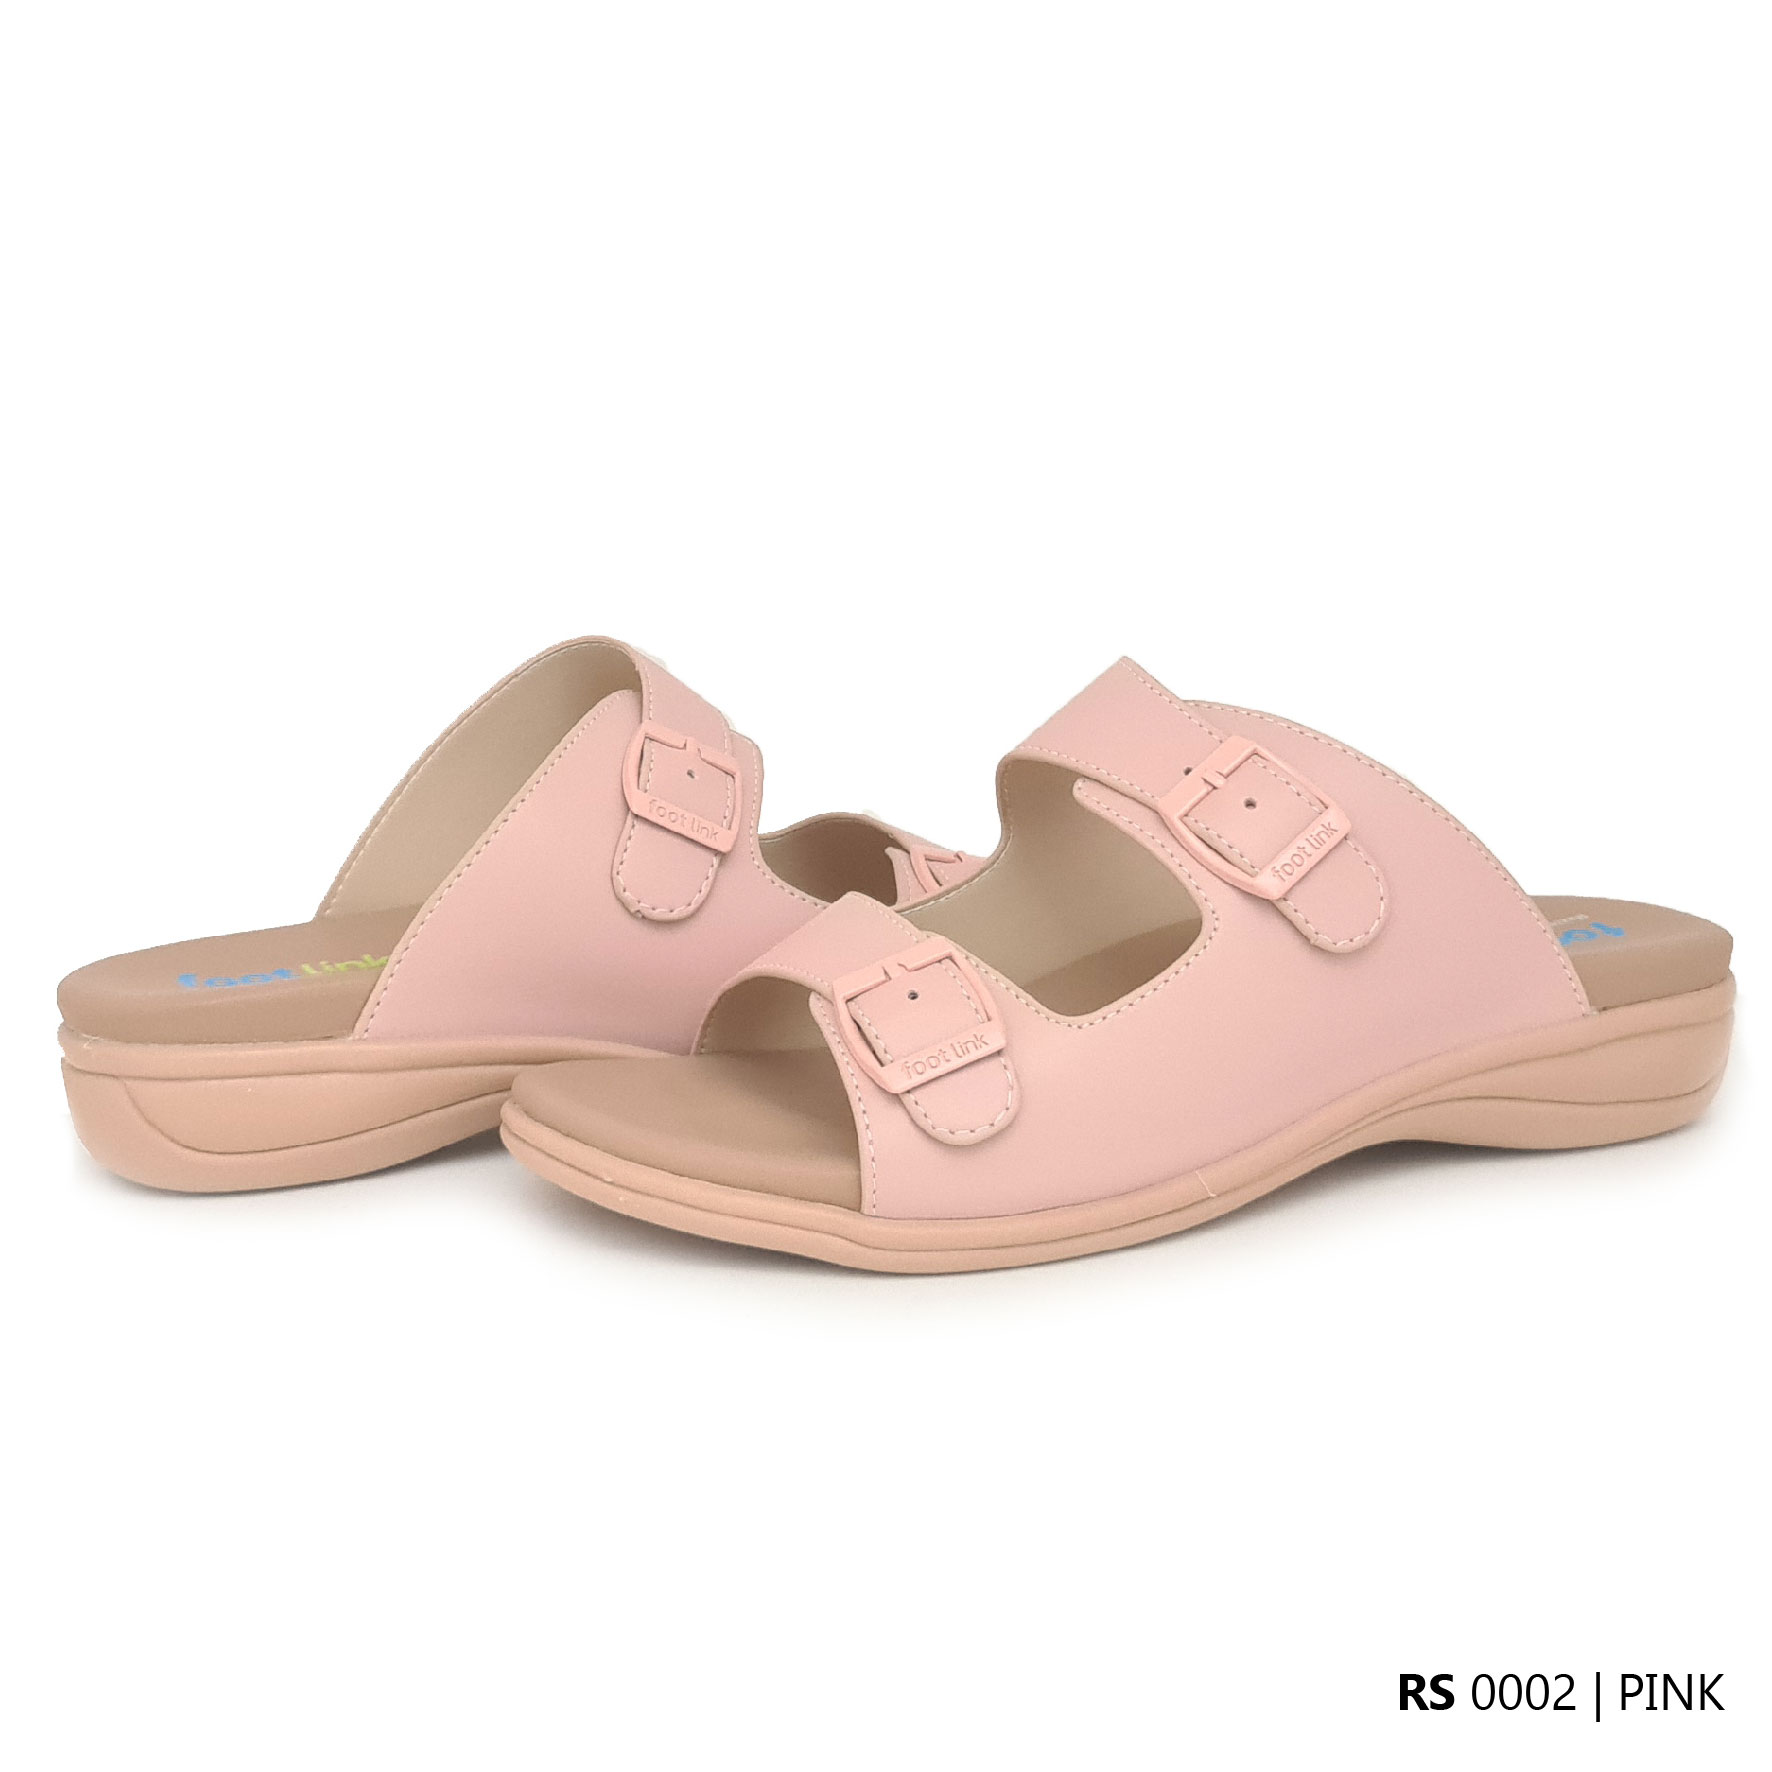 D02 Model RS 0002 - Orthotic Sandals